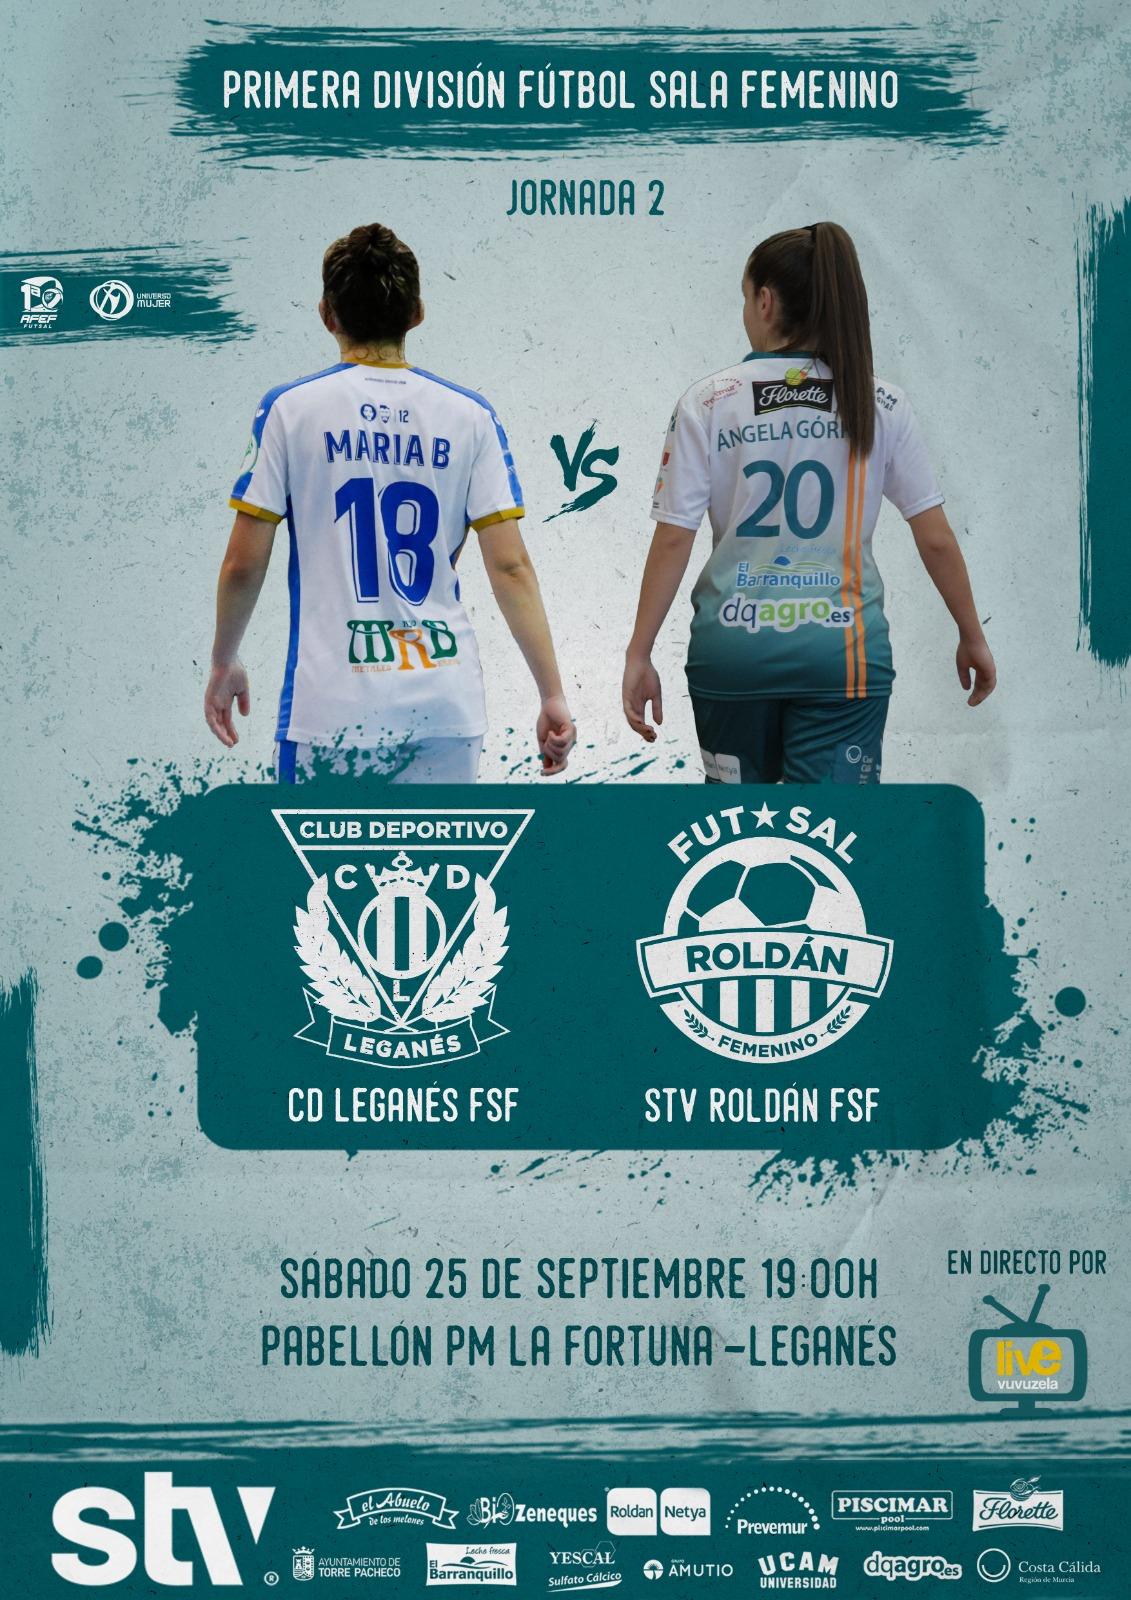 Previa del Partido de Liga de 1ª División: CD Leganés FS - STV Roldán. Jornada 2ª